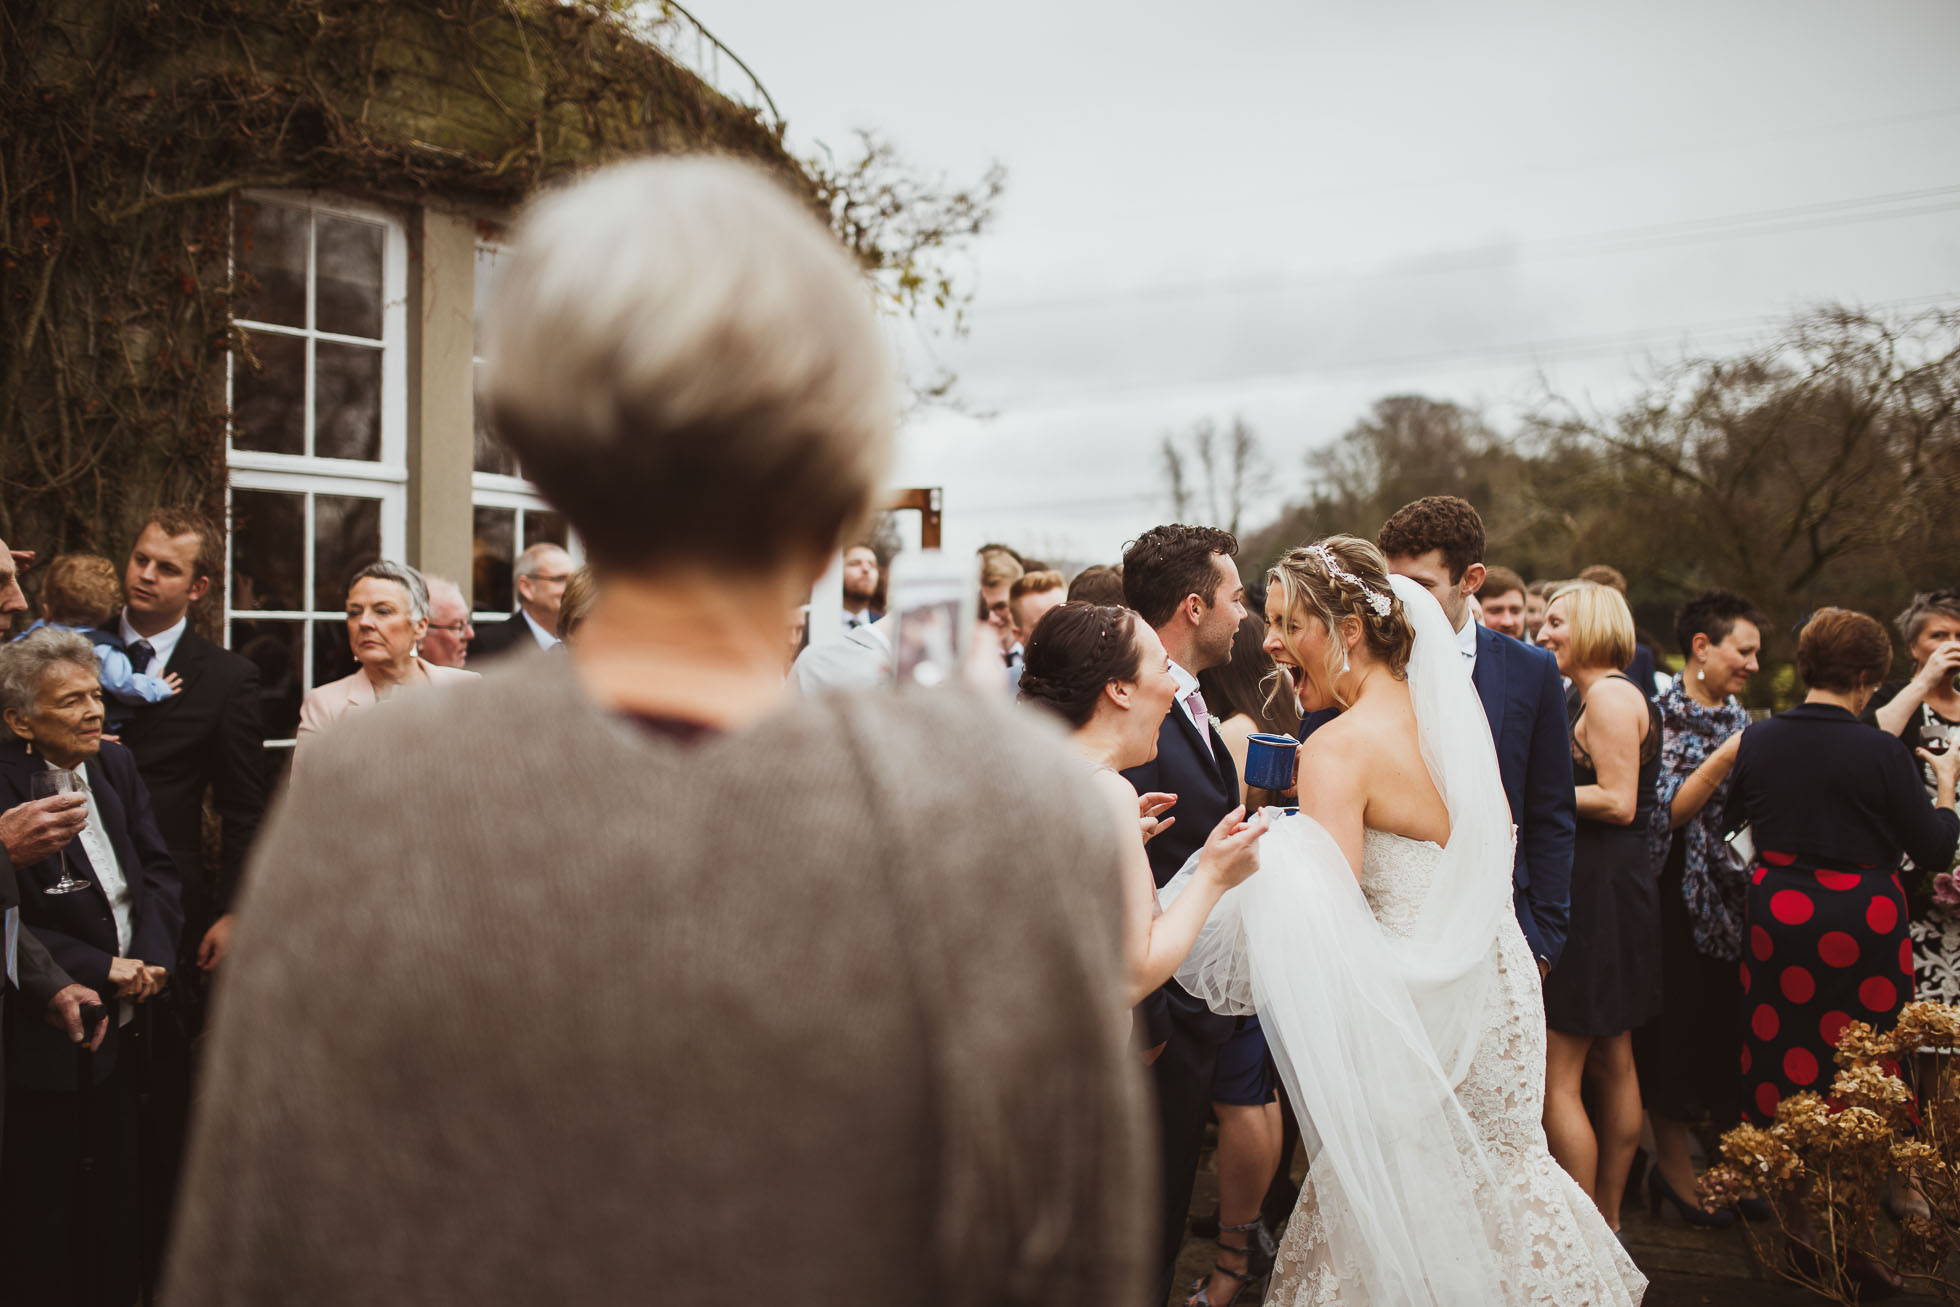 hilltop country house wedding photographer-46.jpg